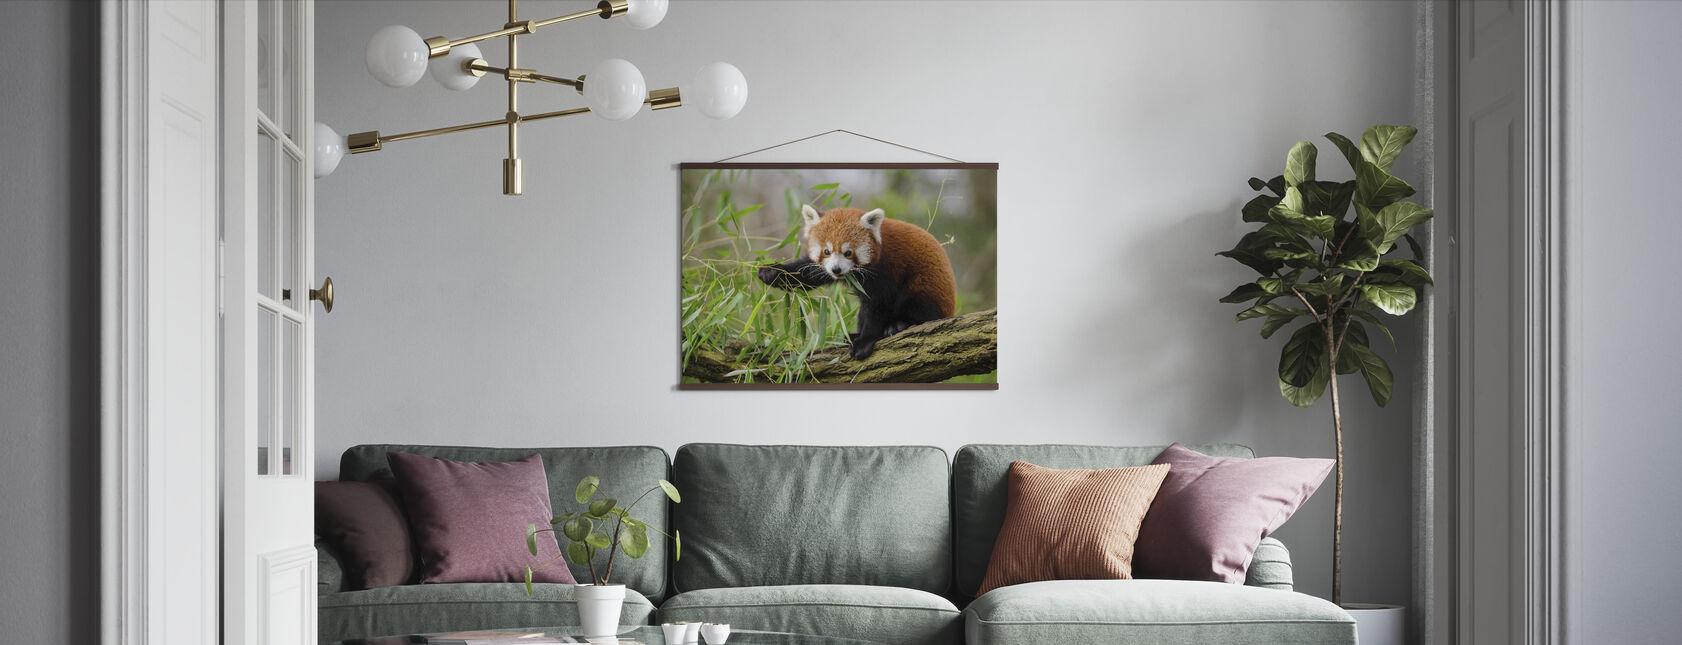 Lille Rød Panda - Plakat - Stue